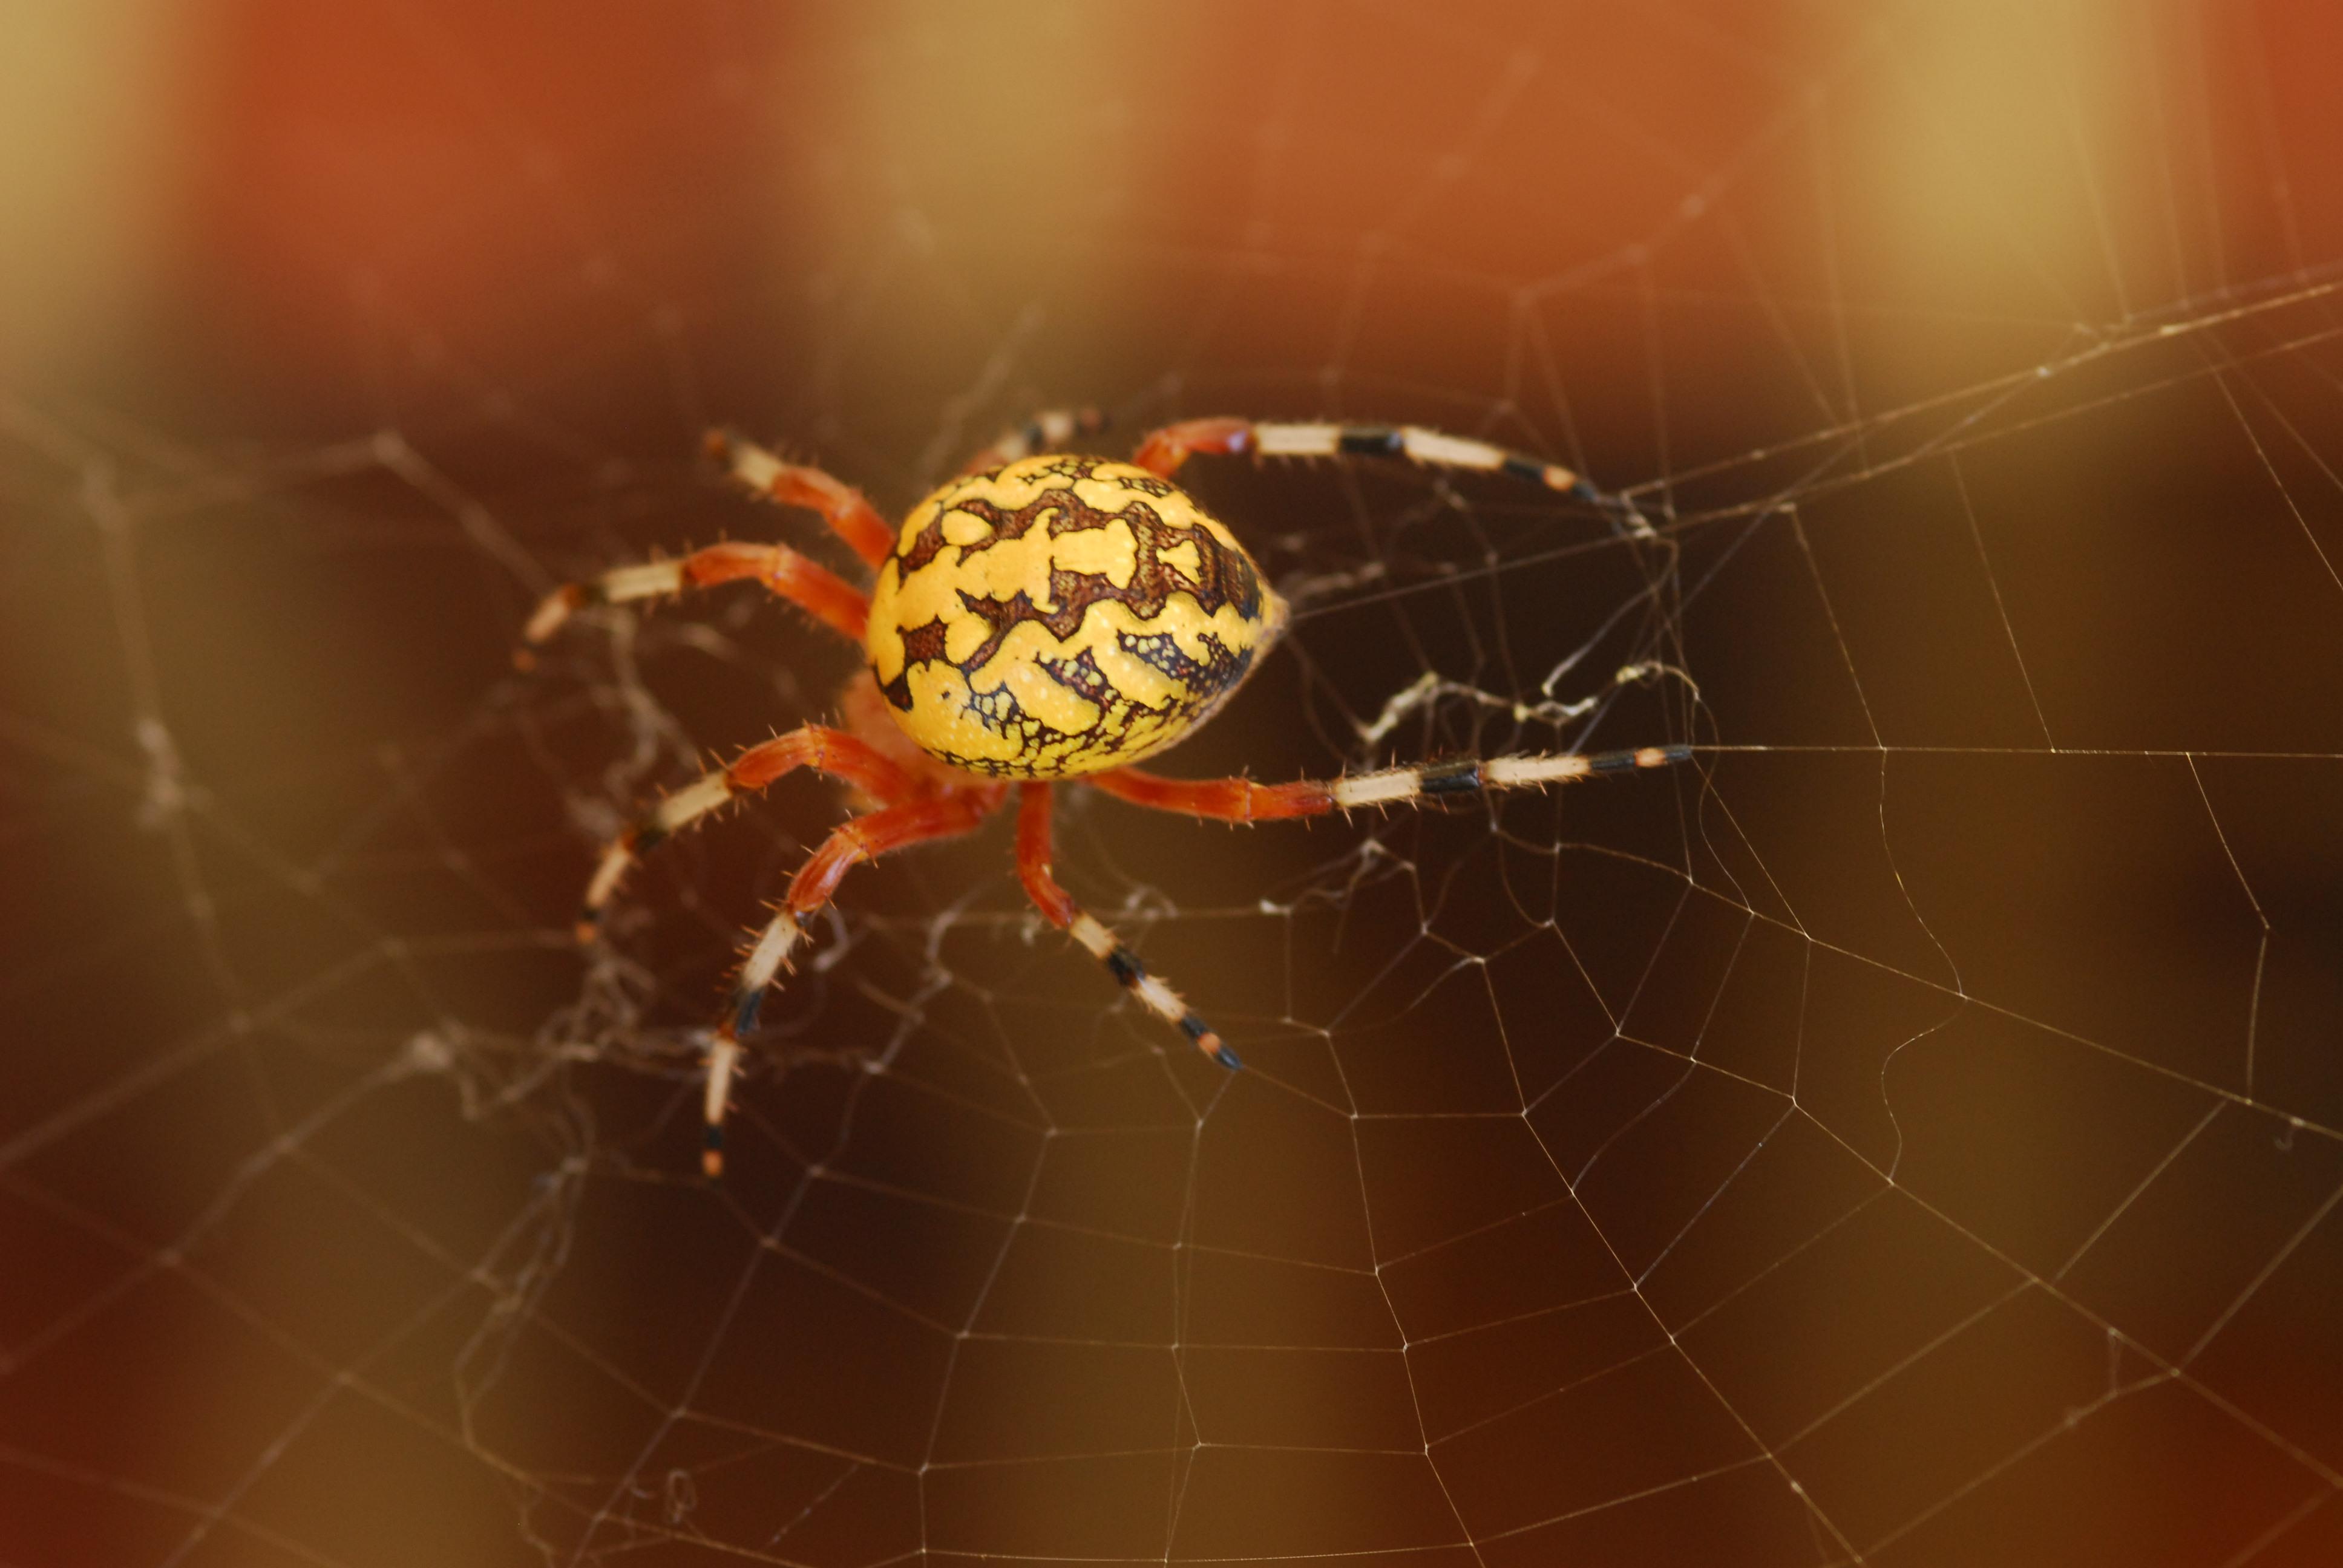 What is That Big Orange Spider? - The Infinite Spider Large orange spider pictures